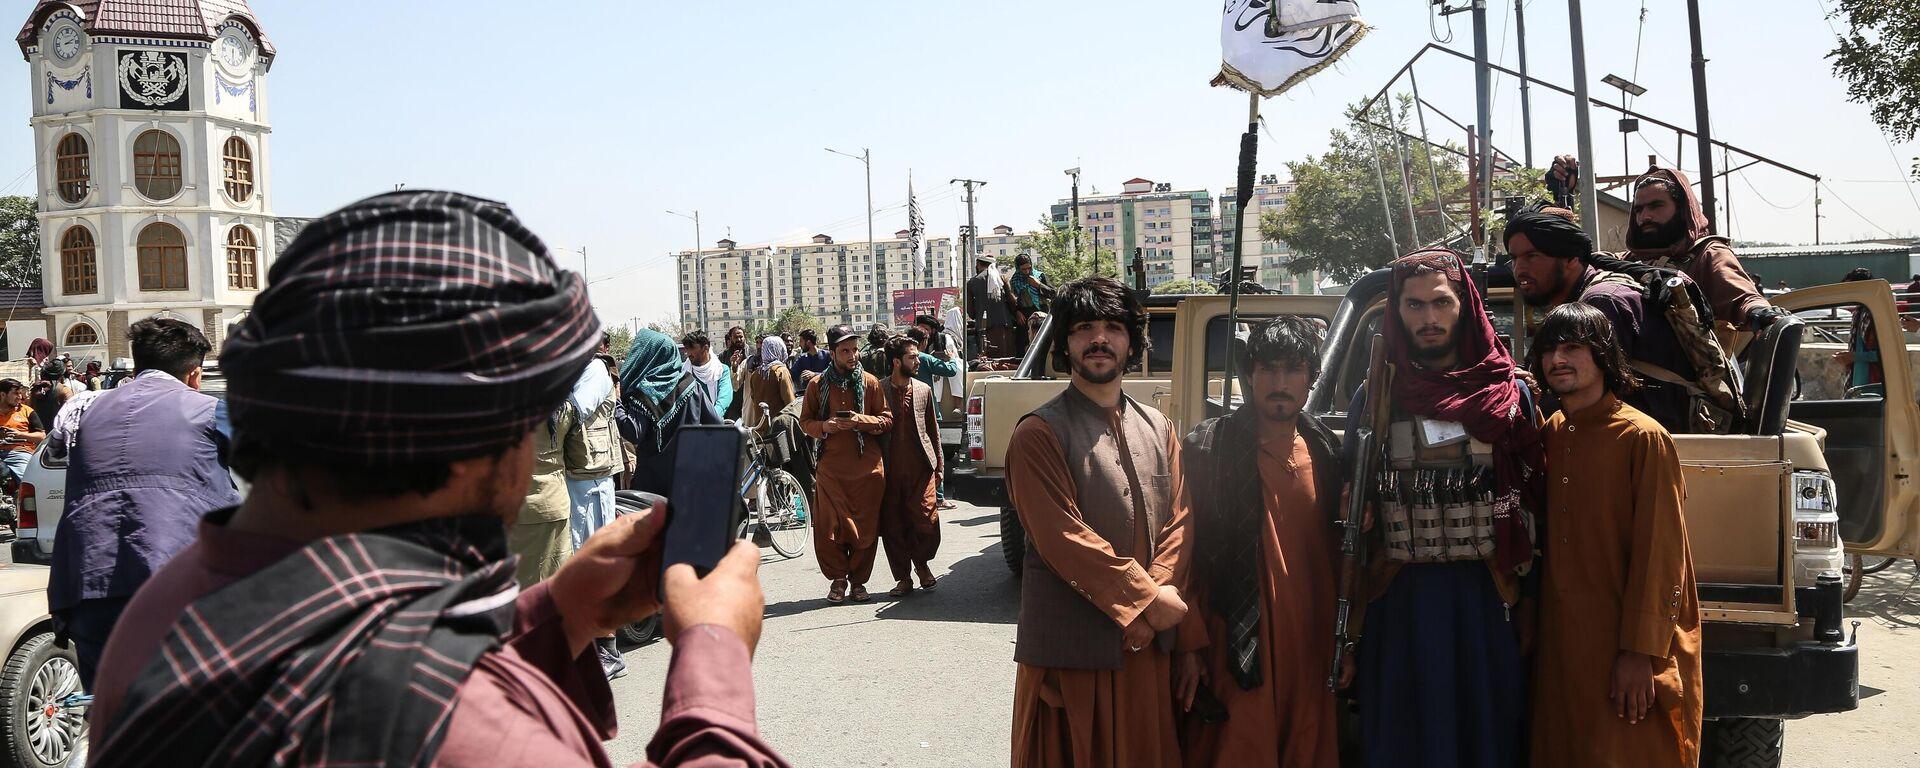 Combattenti talebani* (organizzazione terroristica bandita in Russia ed in altri paesi) a Kabul - Sputnik Italia, 1920, 07.09.2021